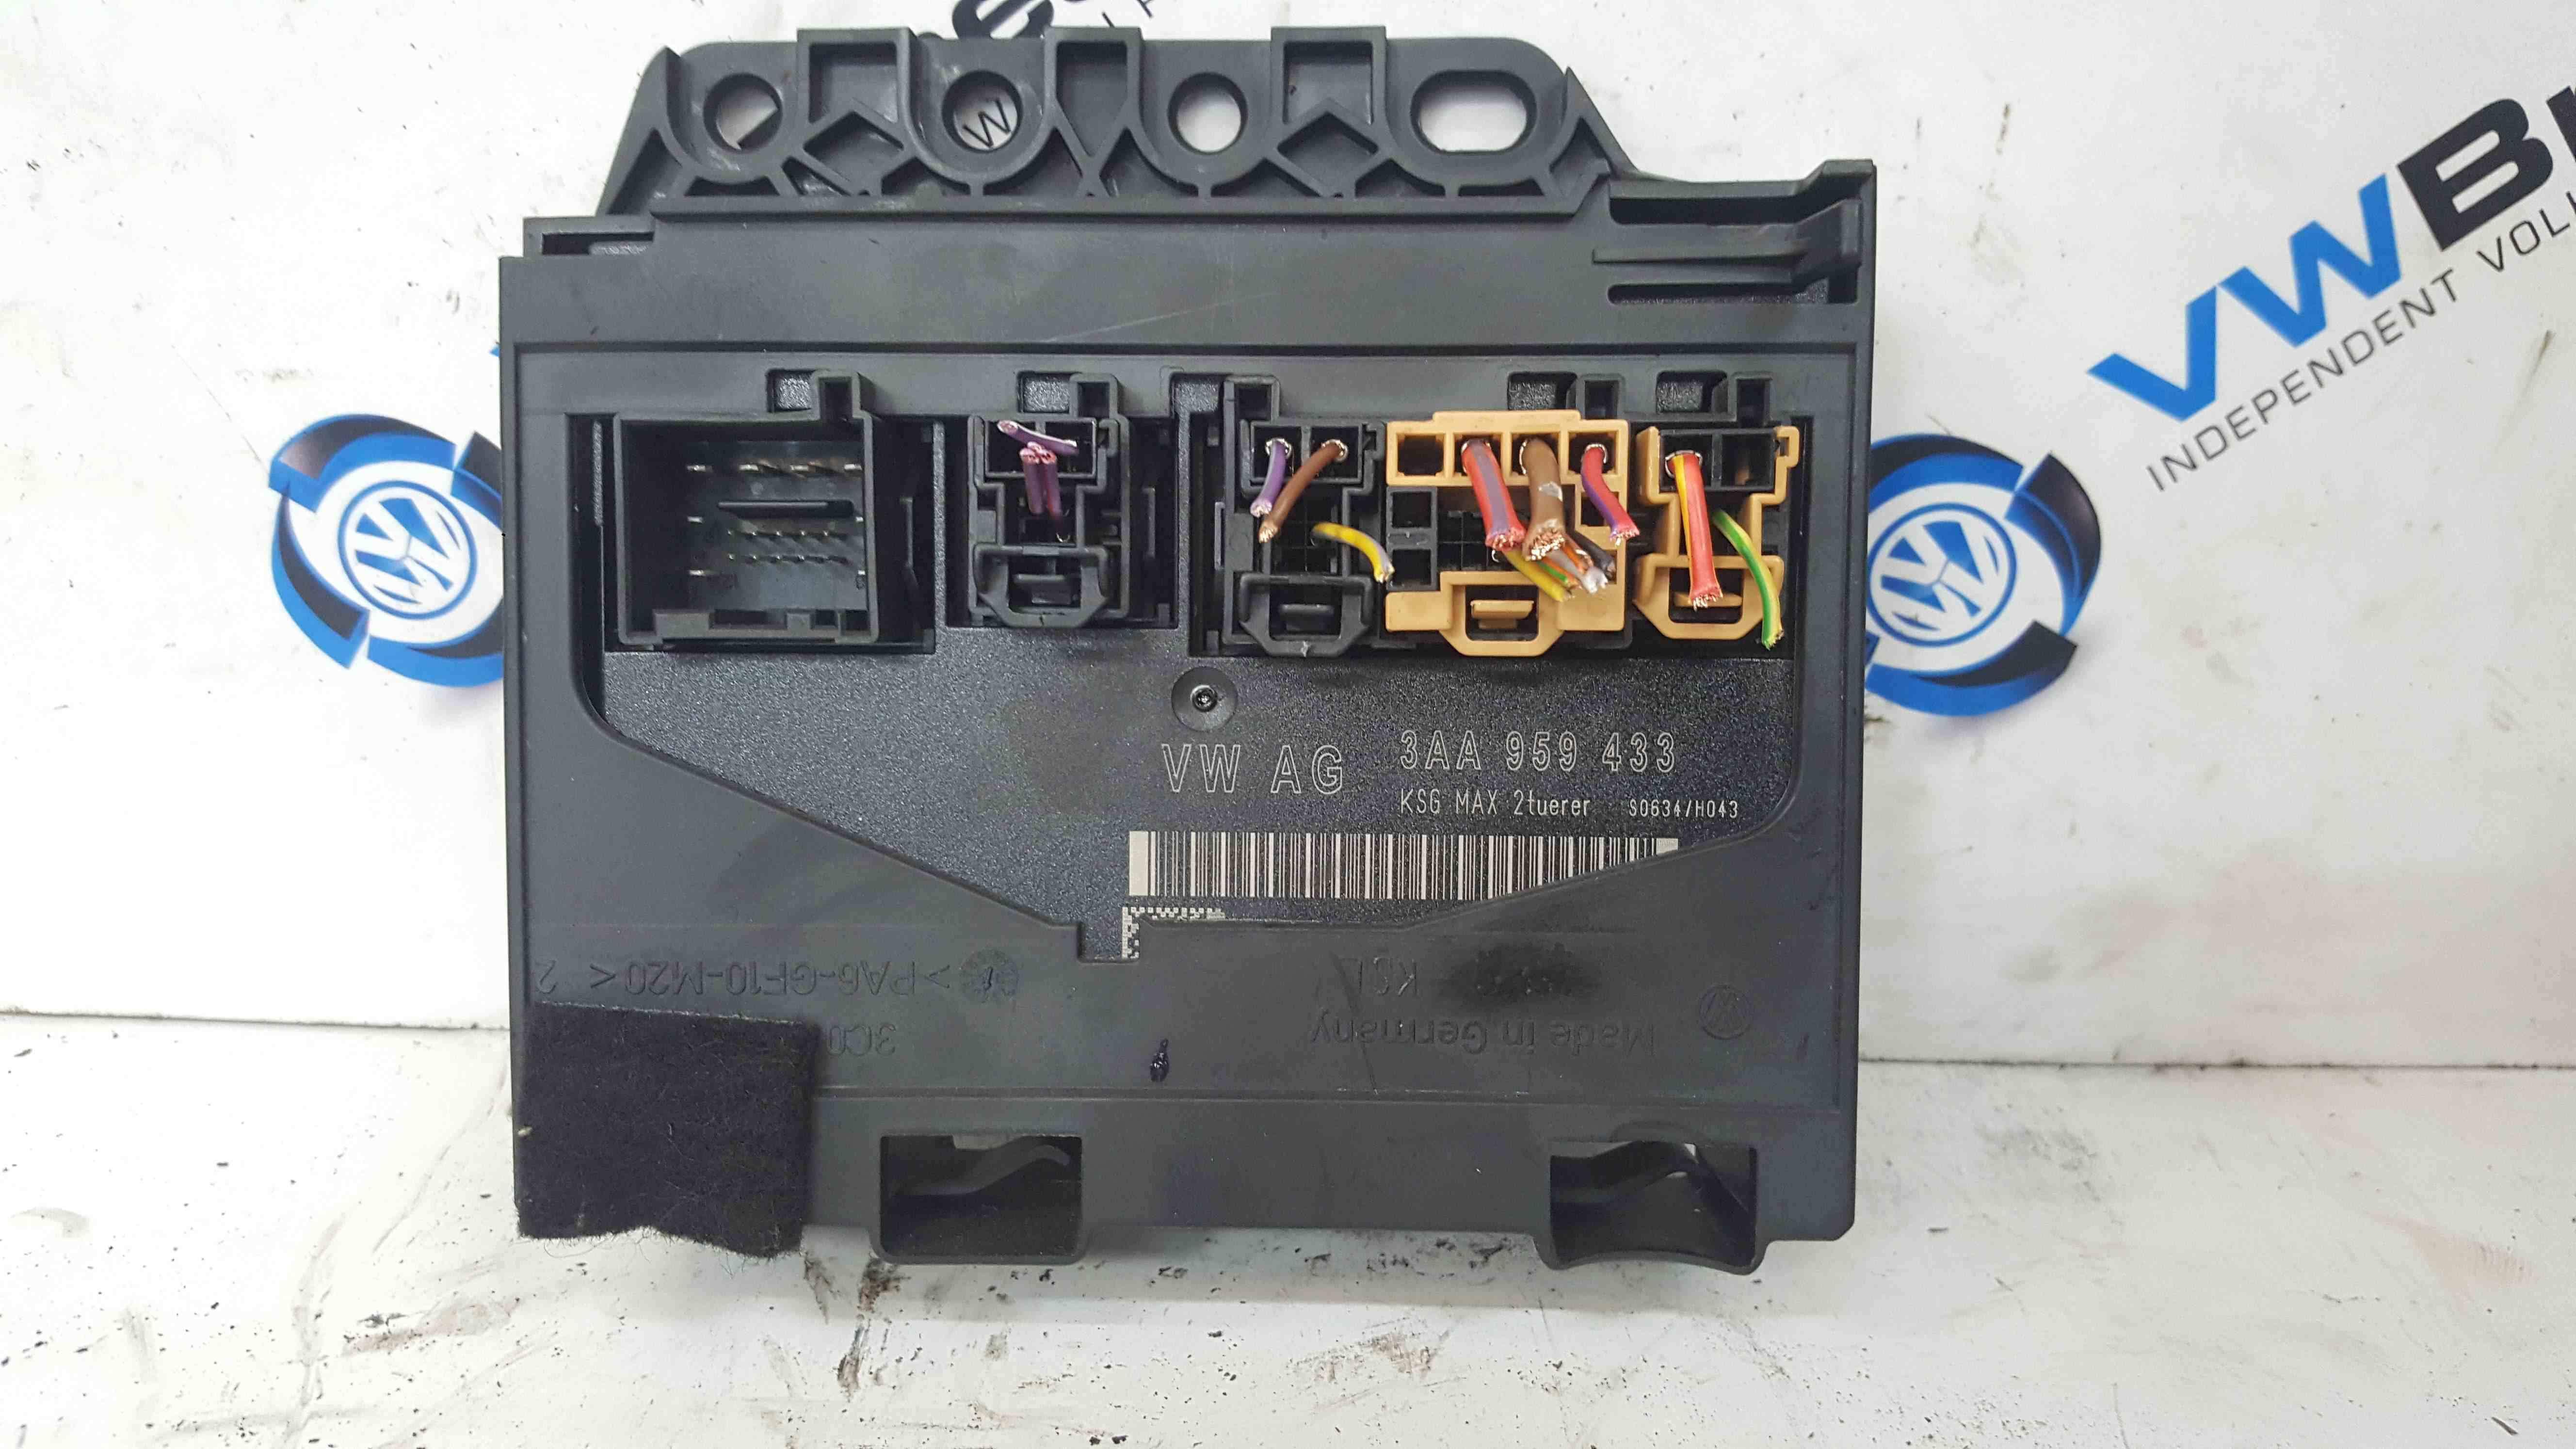 Volkswagen Passat B7 2010-2015 Body Control Module On Board Box 3AA959433